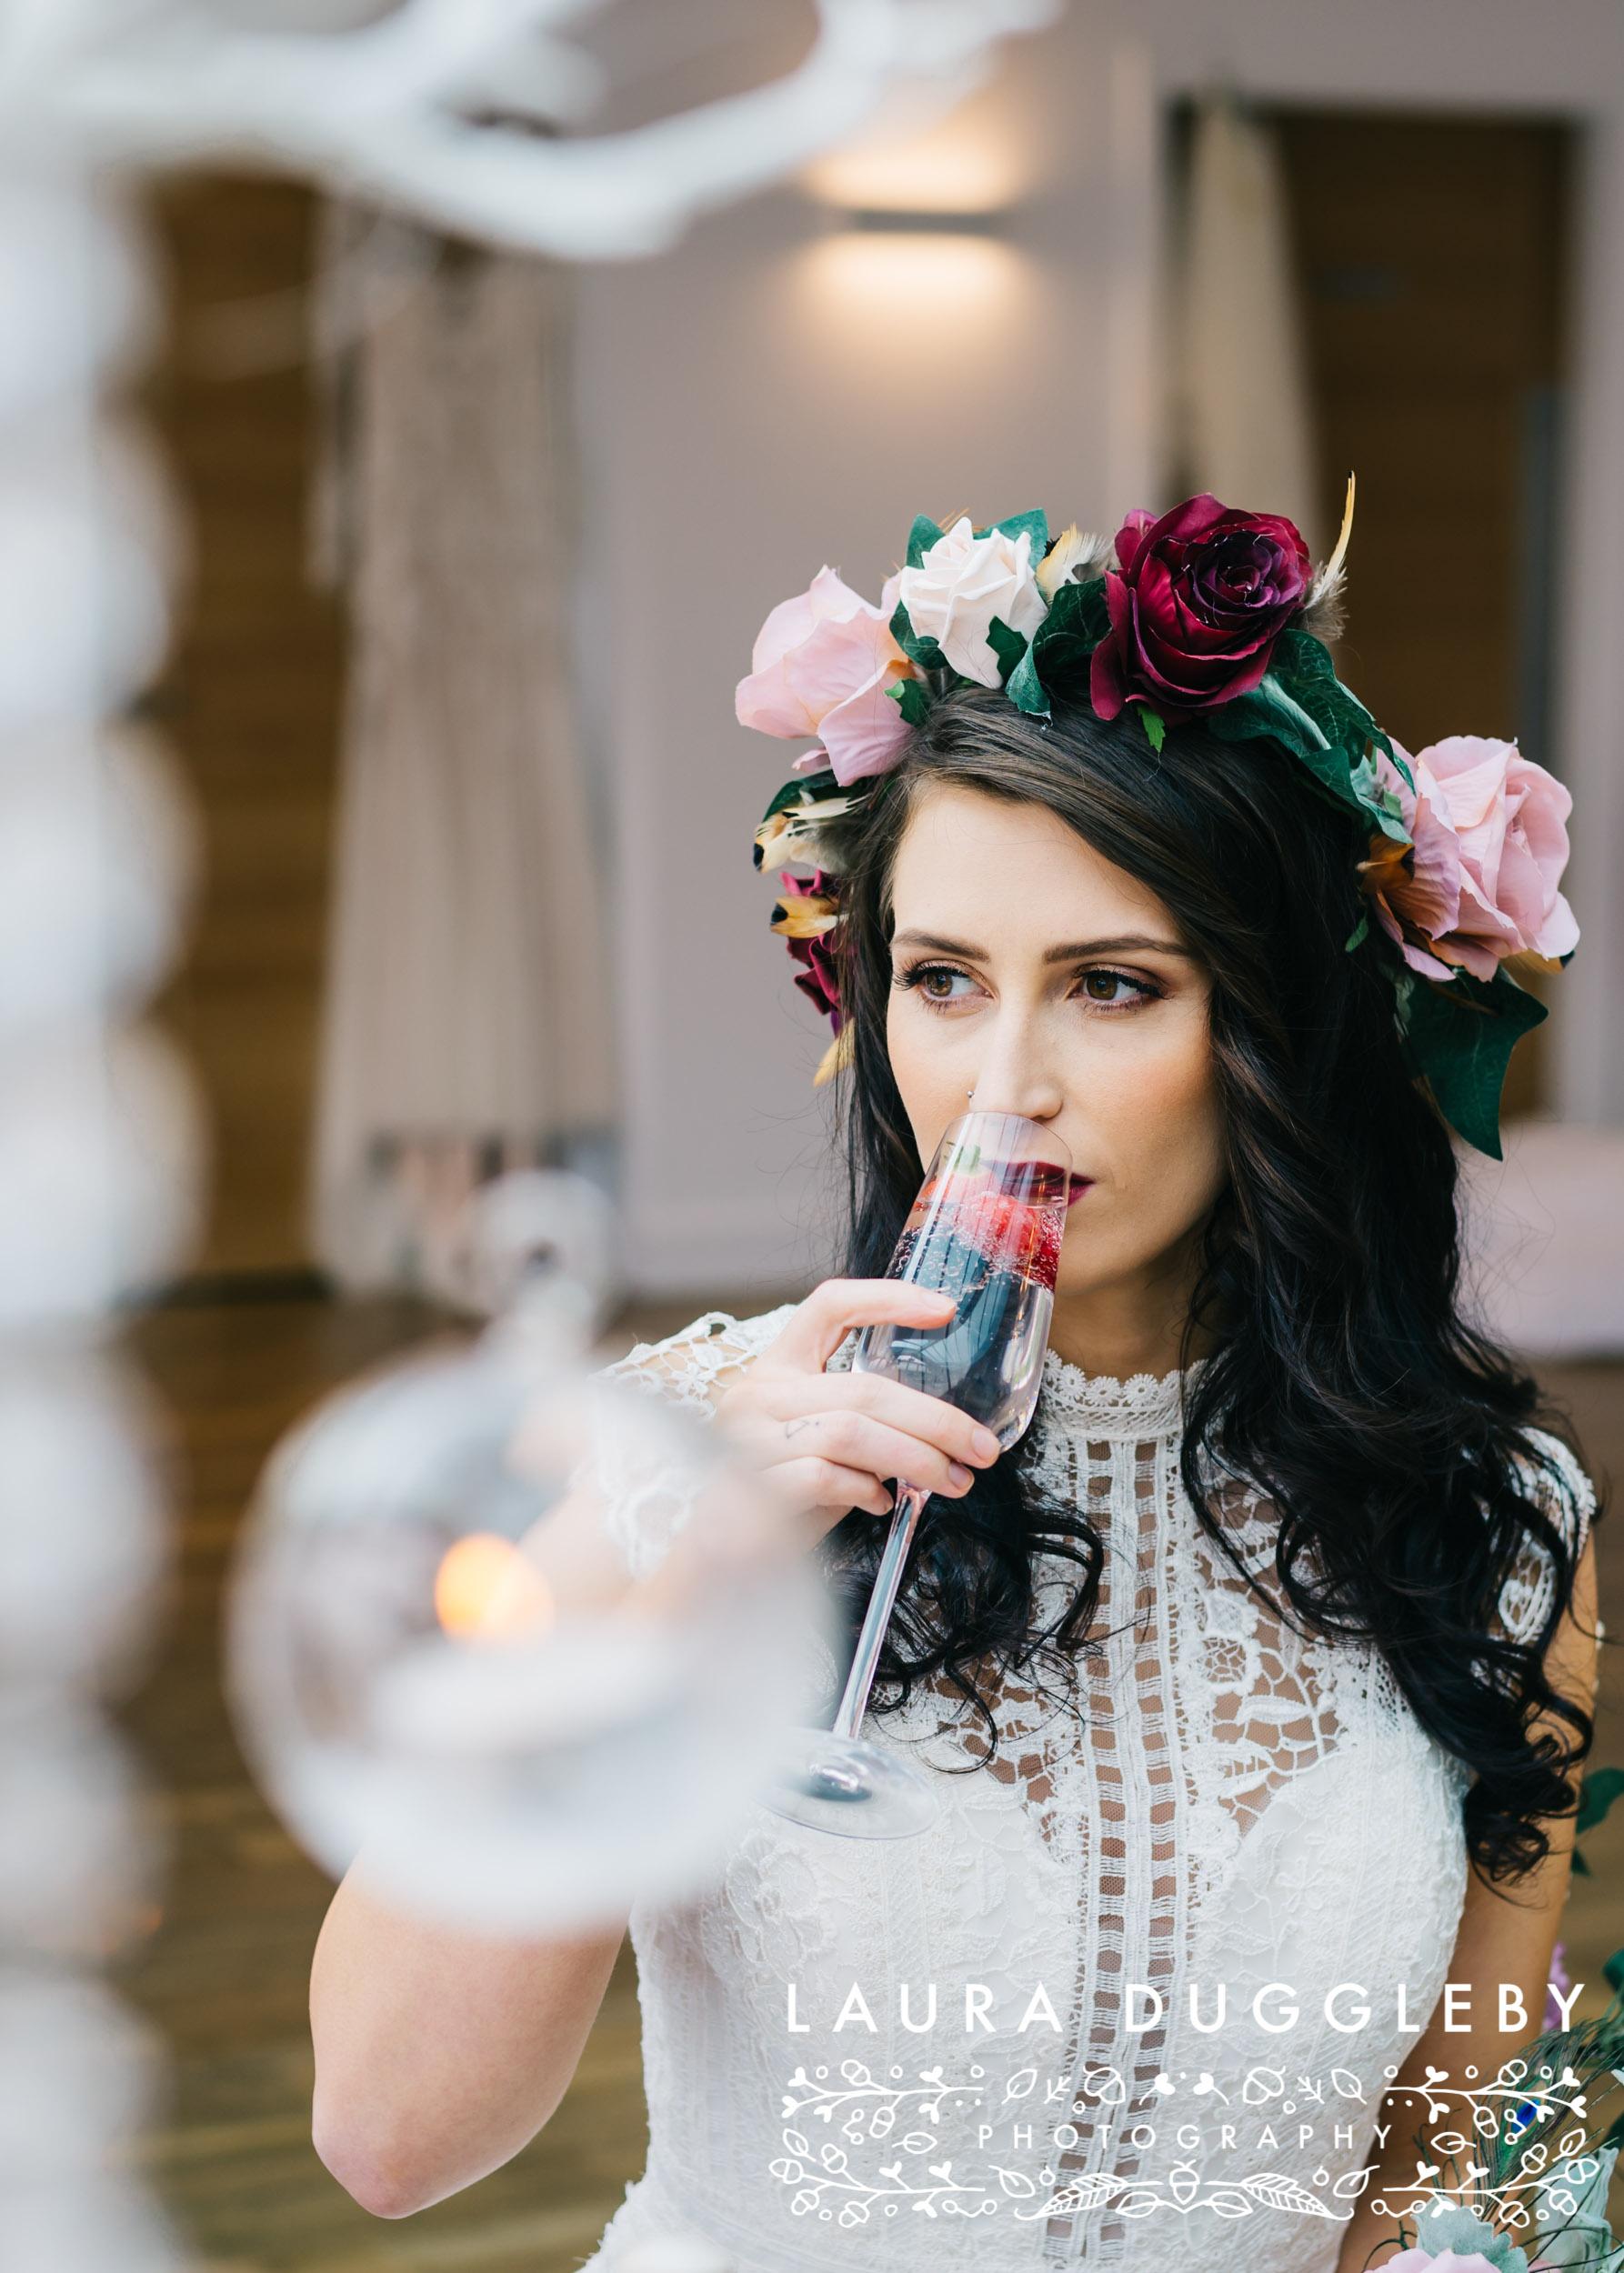 Thornton Hall Country Park - Wedding Photographer16